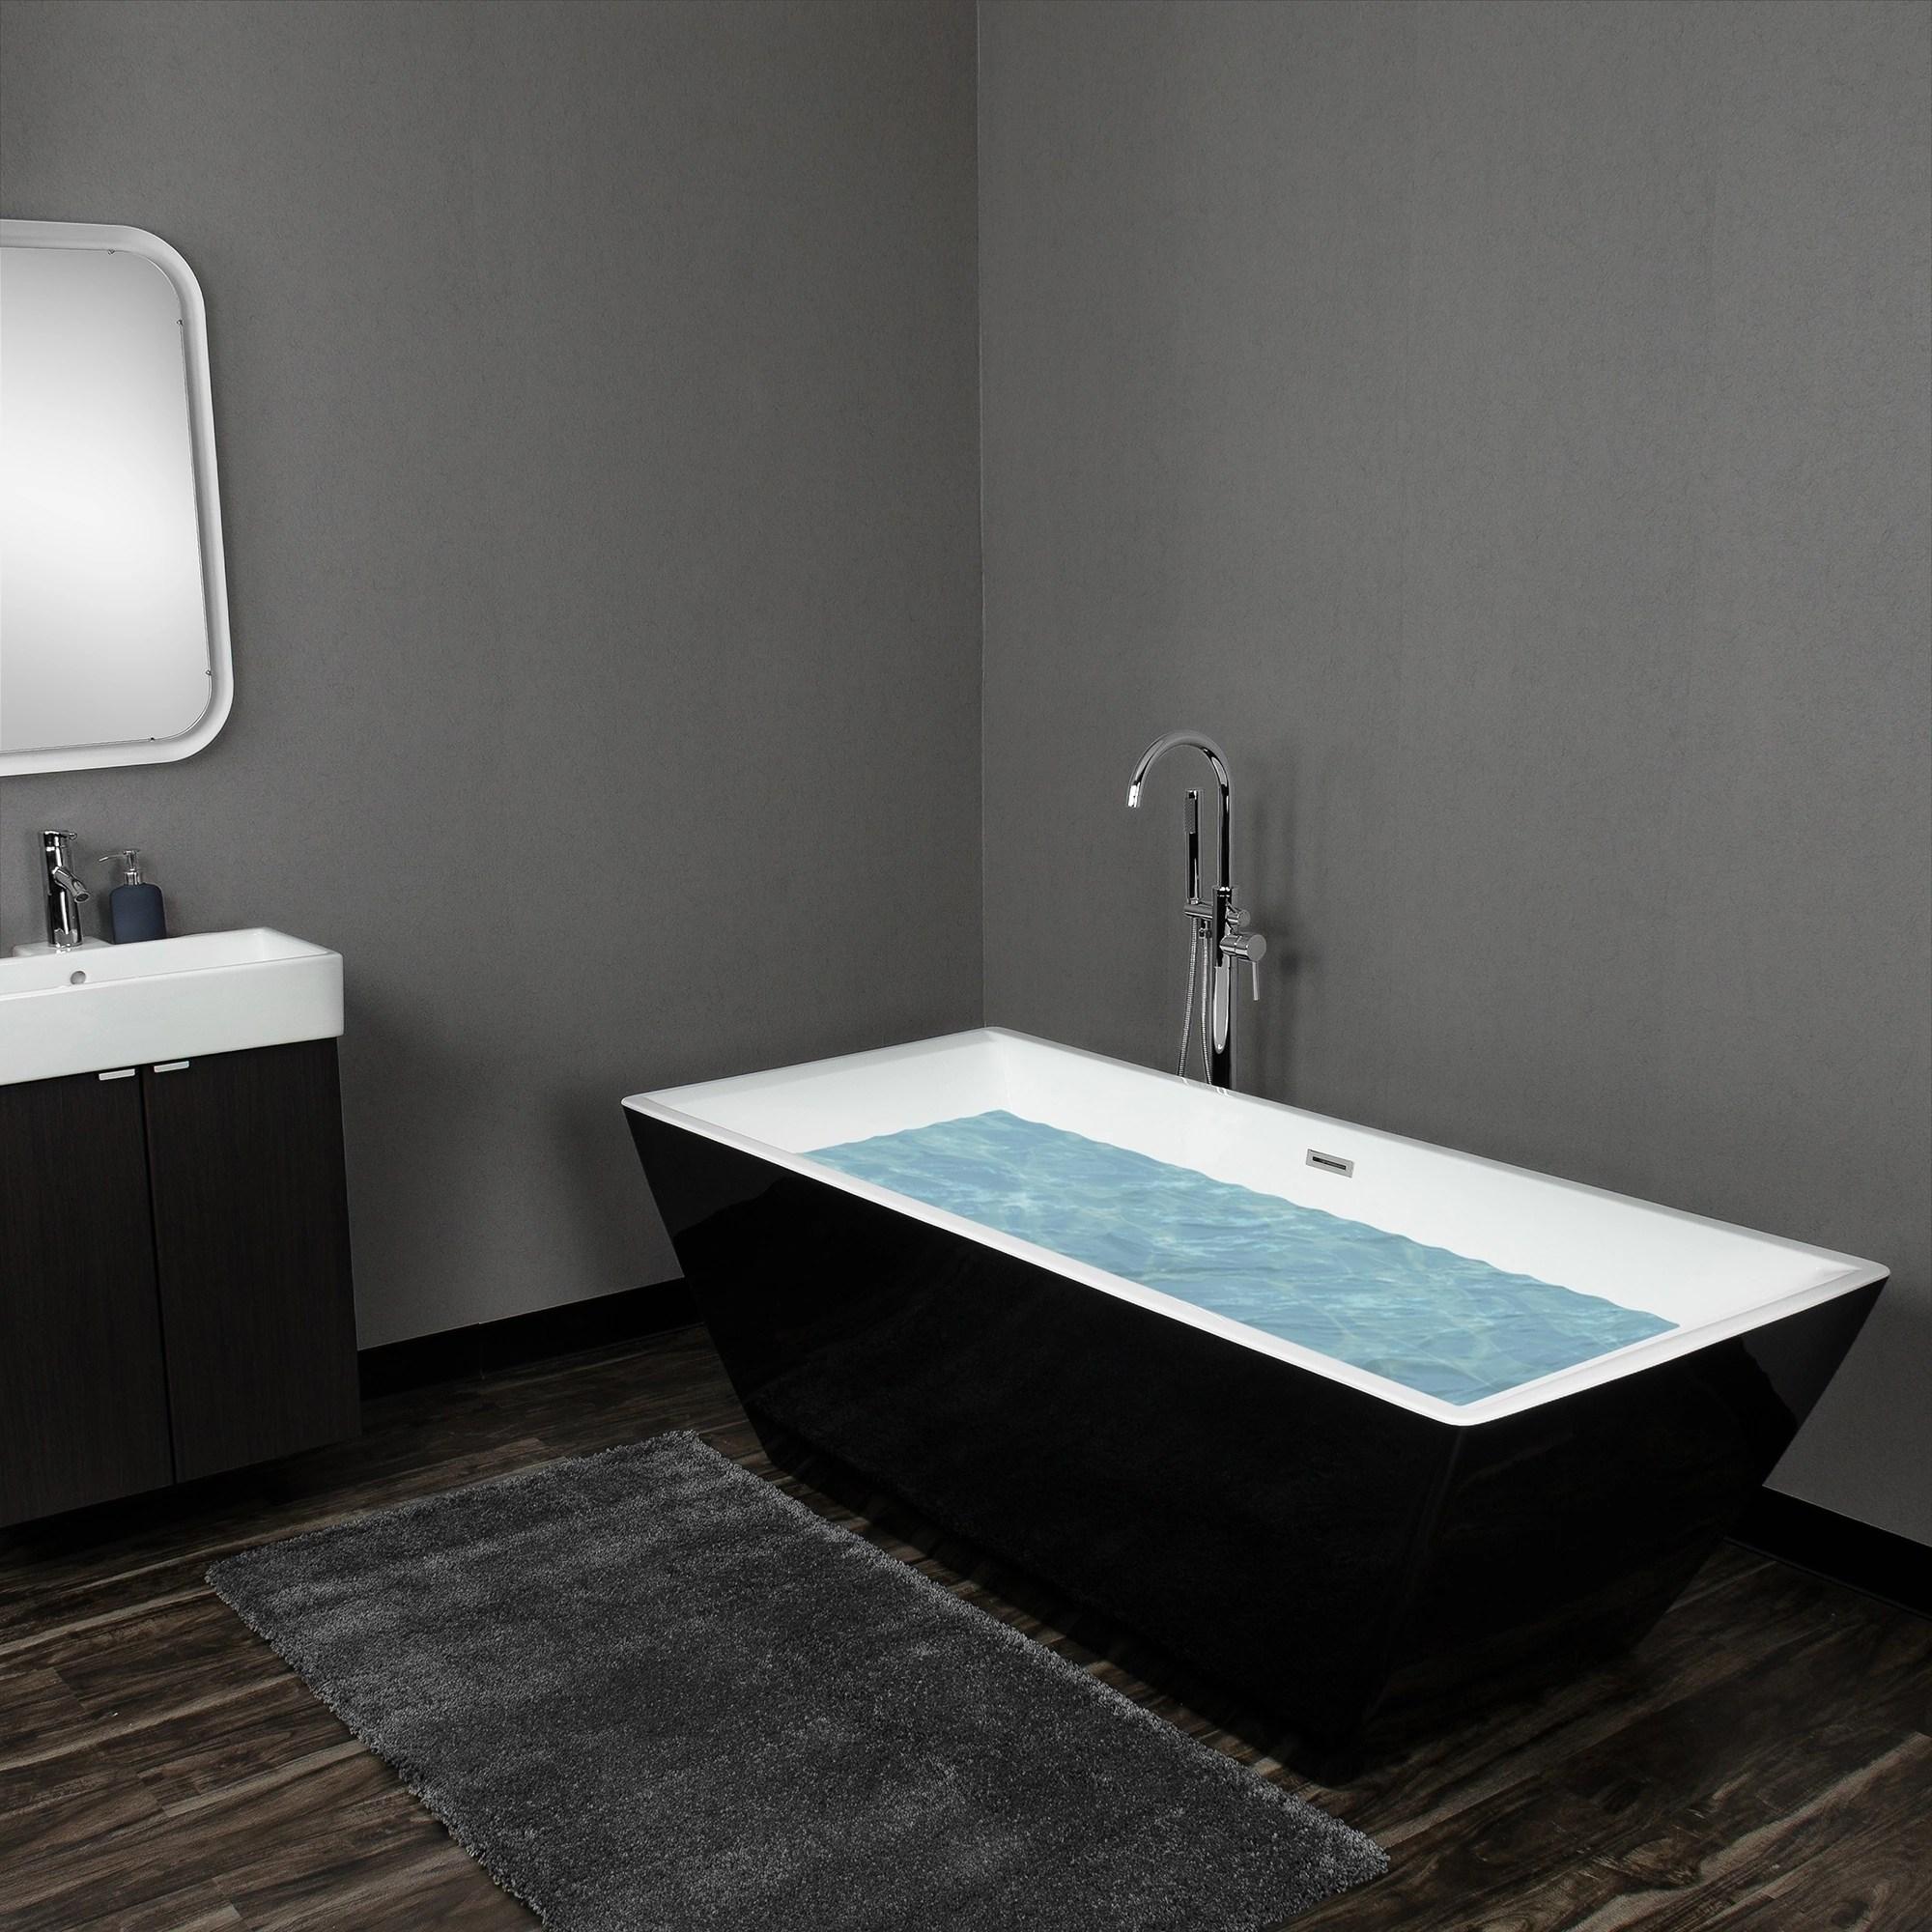 Akdy 71 White Acrylic Modern Square Soaking Shower Freestanding Bathroom Bath Tub